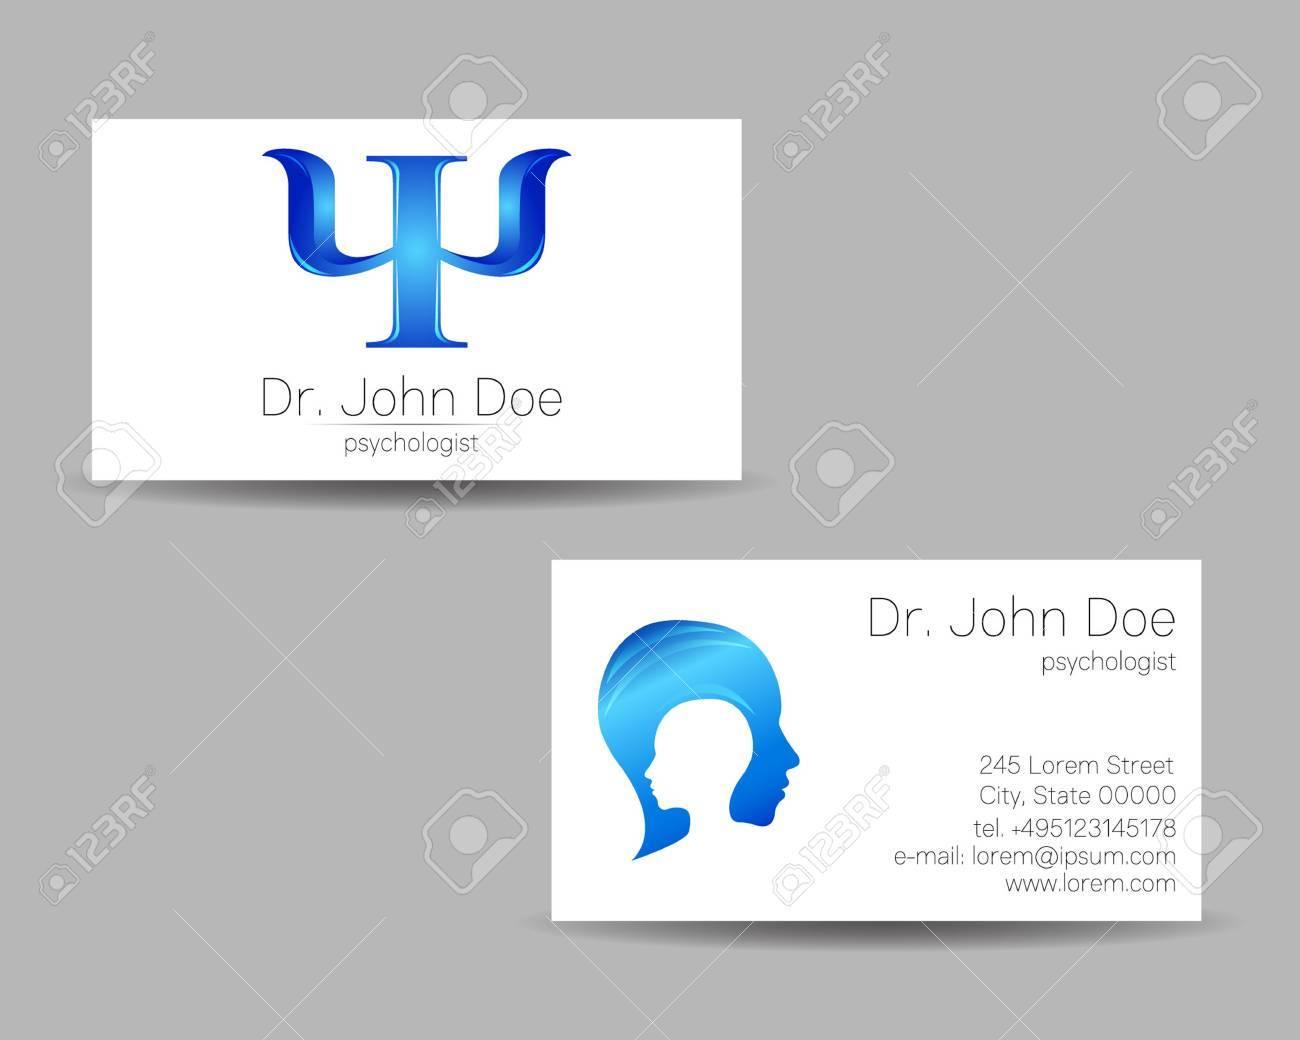 Carte De Visite En Psychologie Icone Moderne Style Creatif Concept Design Banque